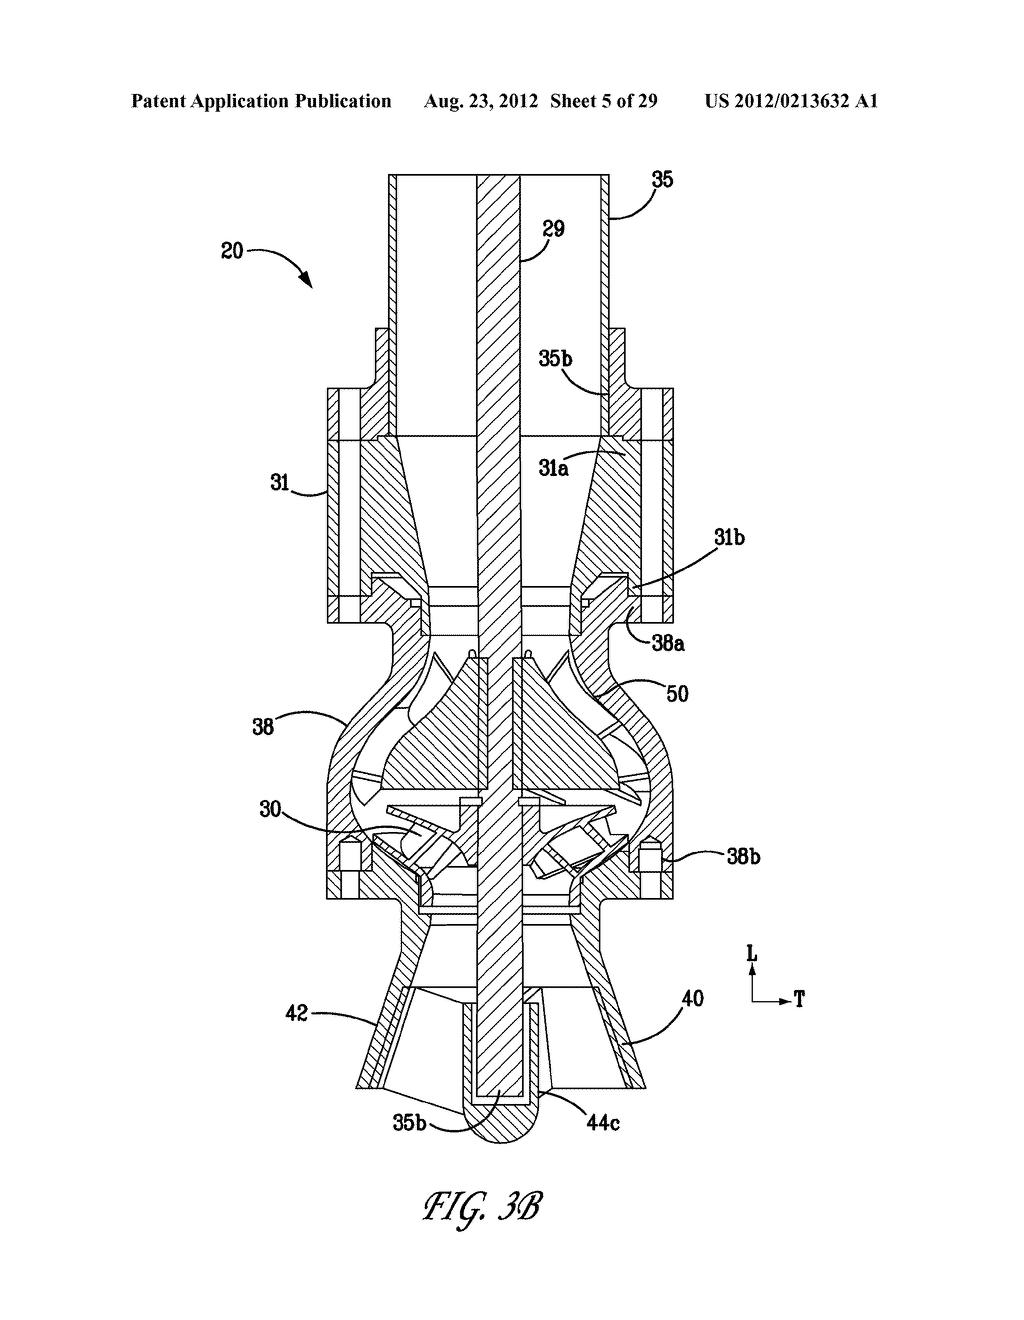 non metallic vertical turbine pump diagram schematic and image 06 rh patentsencyclopedia com Vertical Centrifugal Pump Diagram vertical turbine pump layout